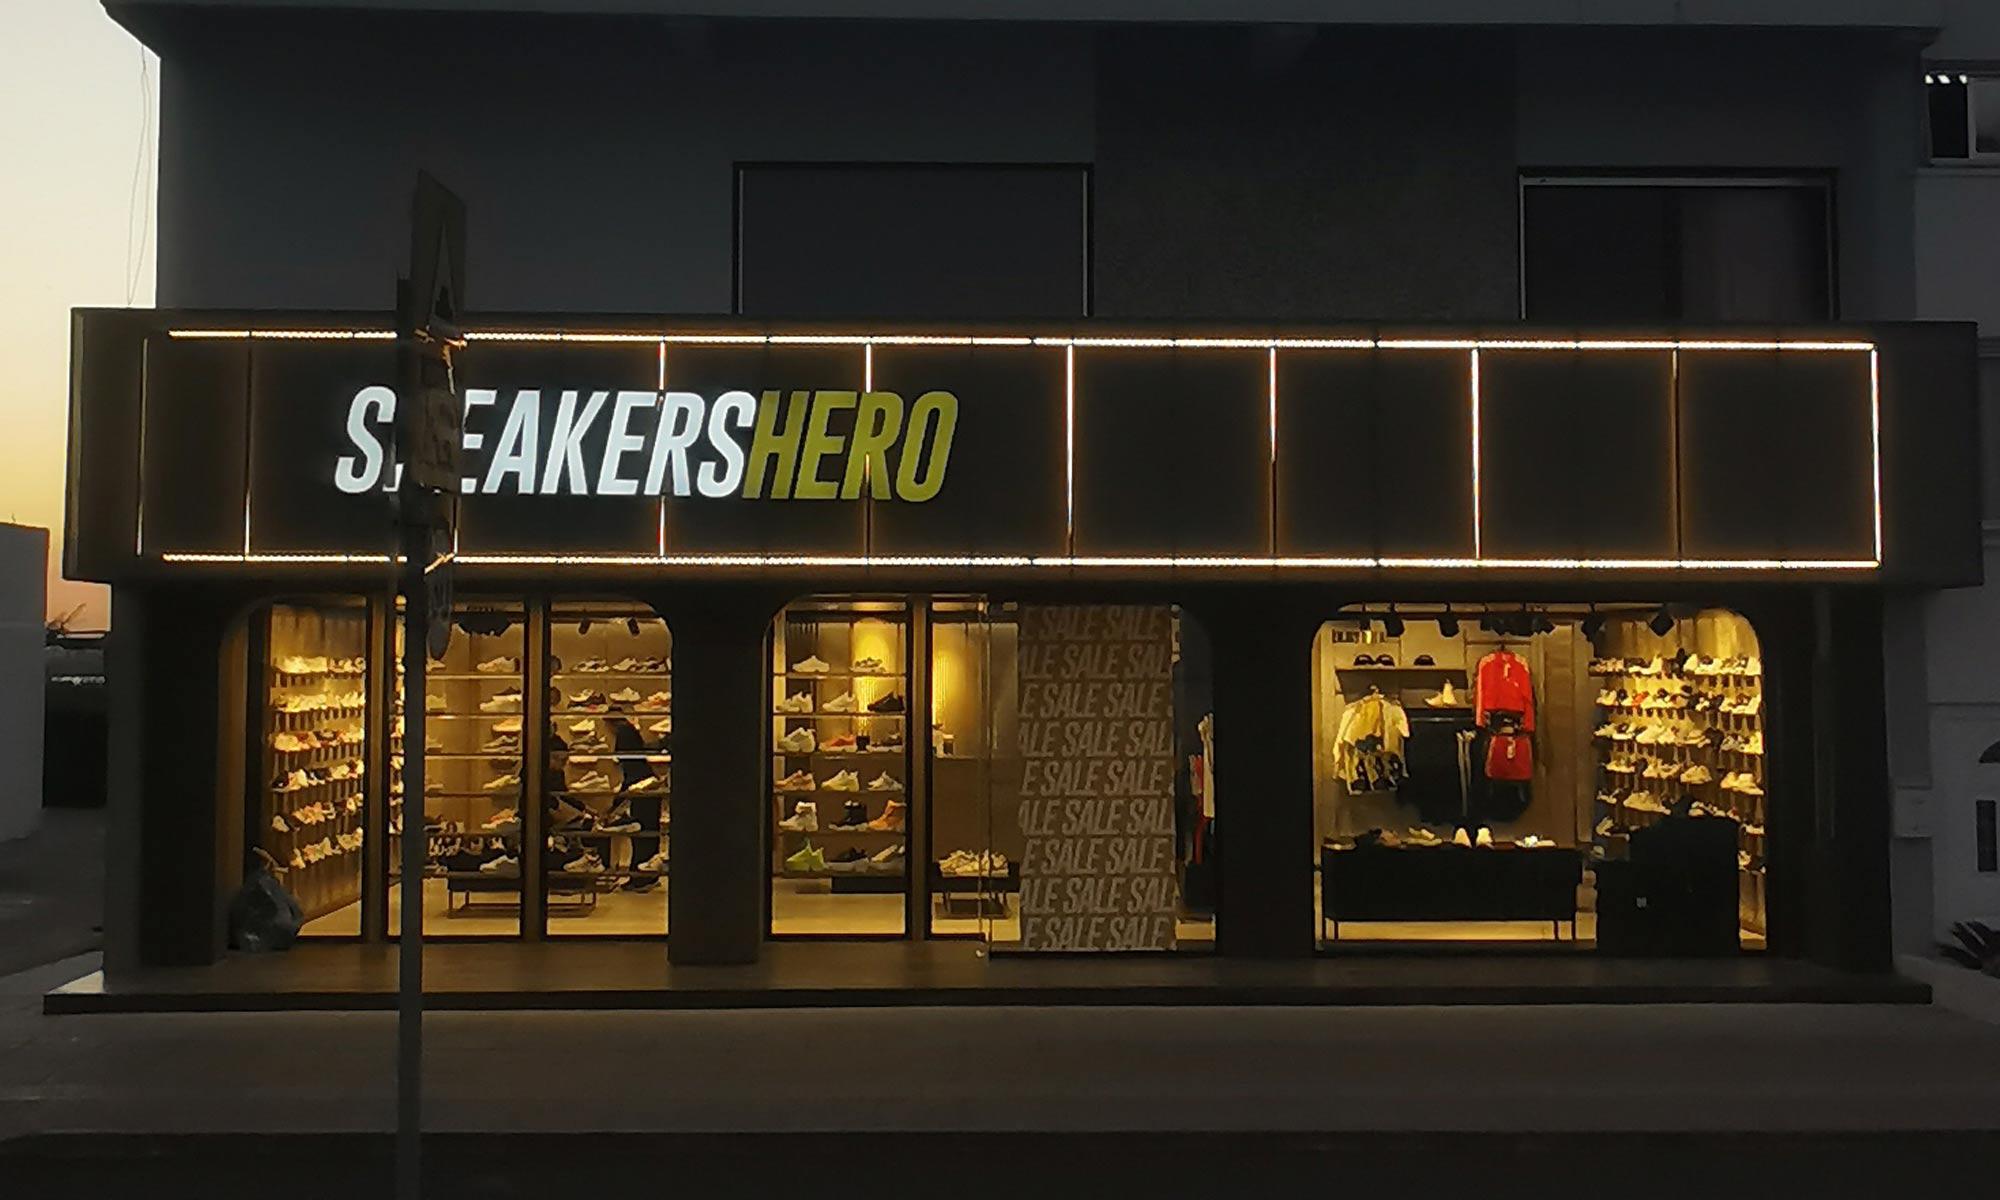 https://www.atelierzoz.com/wp-content/uploads/2020/03/works_atelierzoz_sneakershero-paralimni-2.jpg